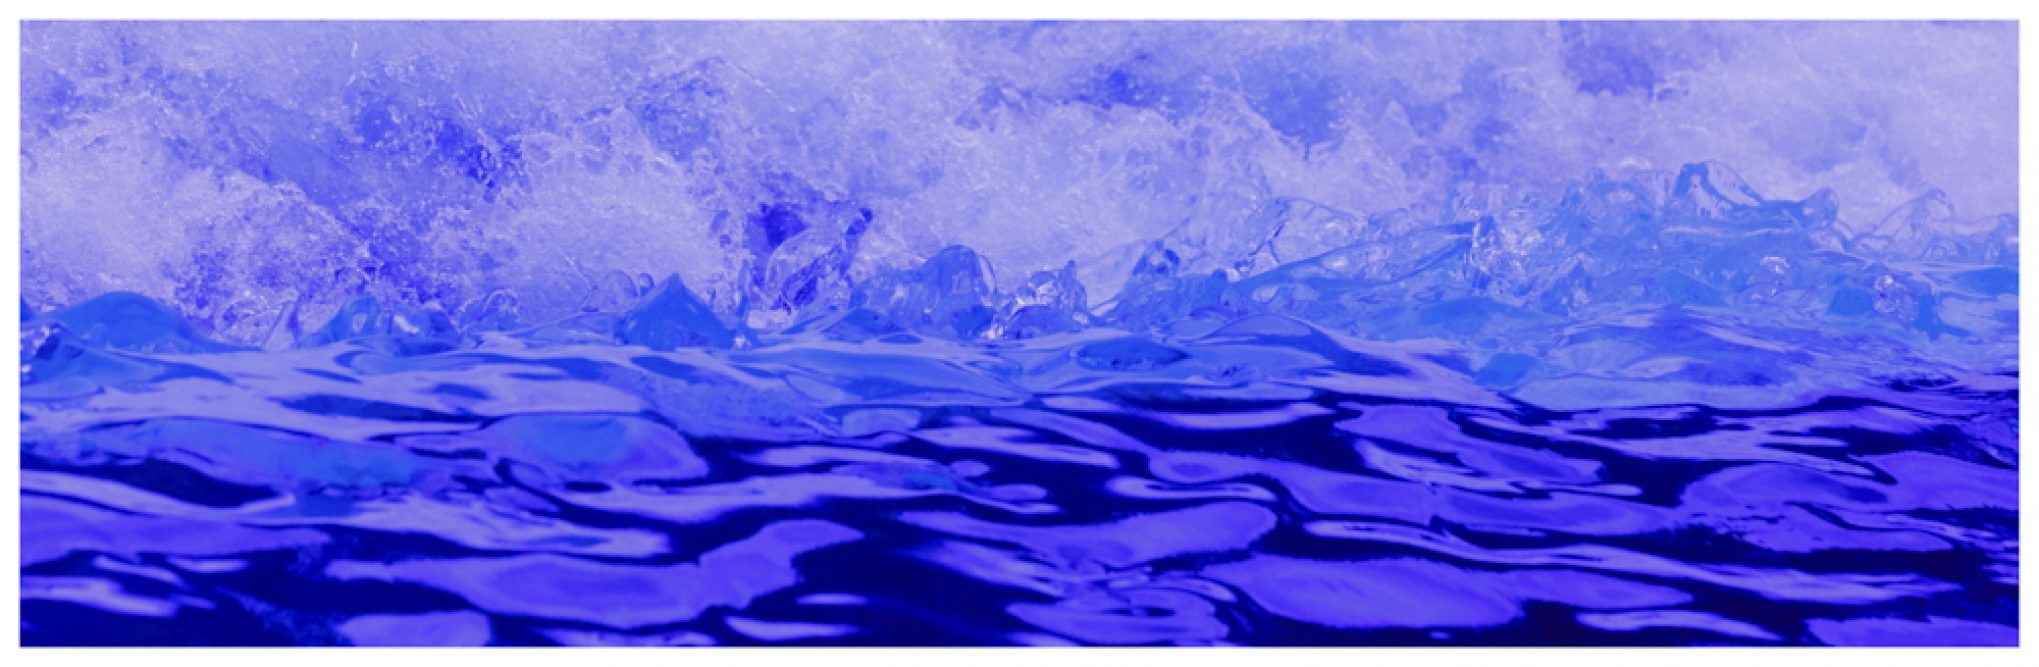 Platz 45 - Hajo Schumacher - Blue Water